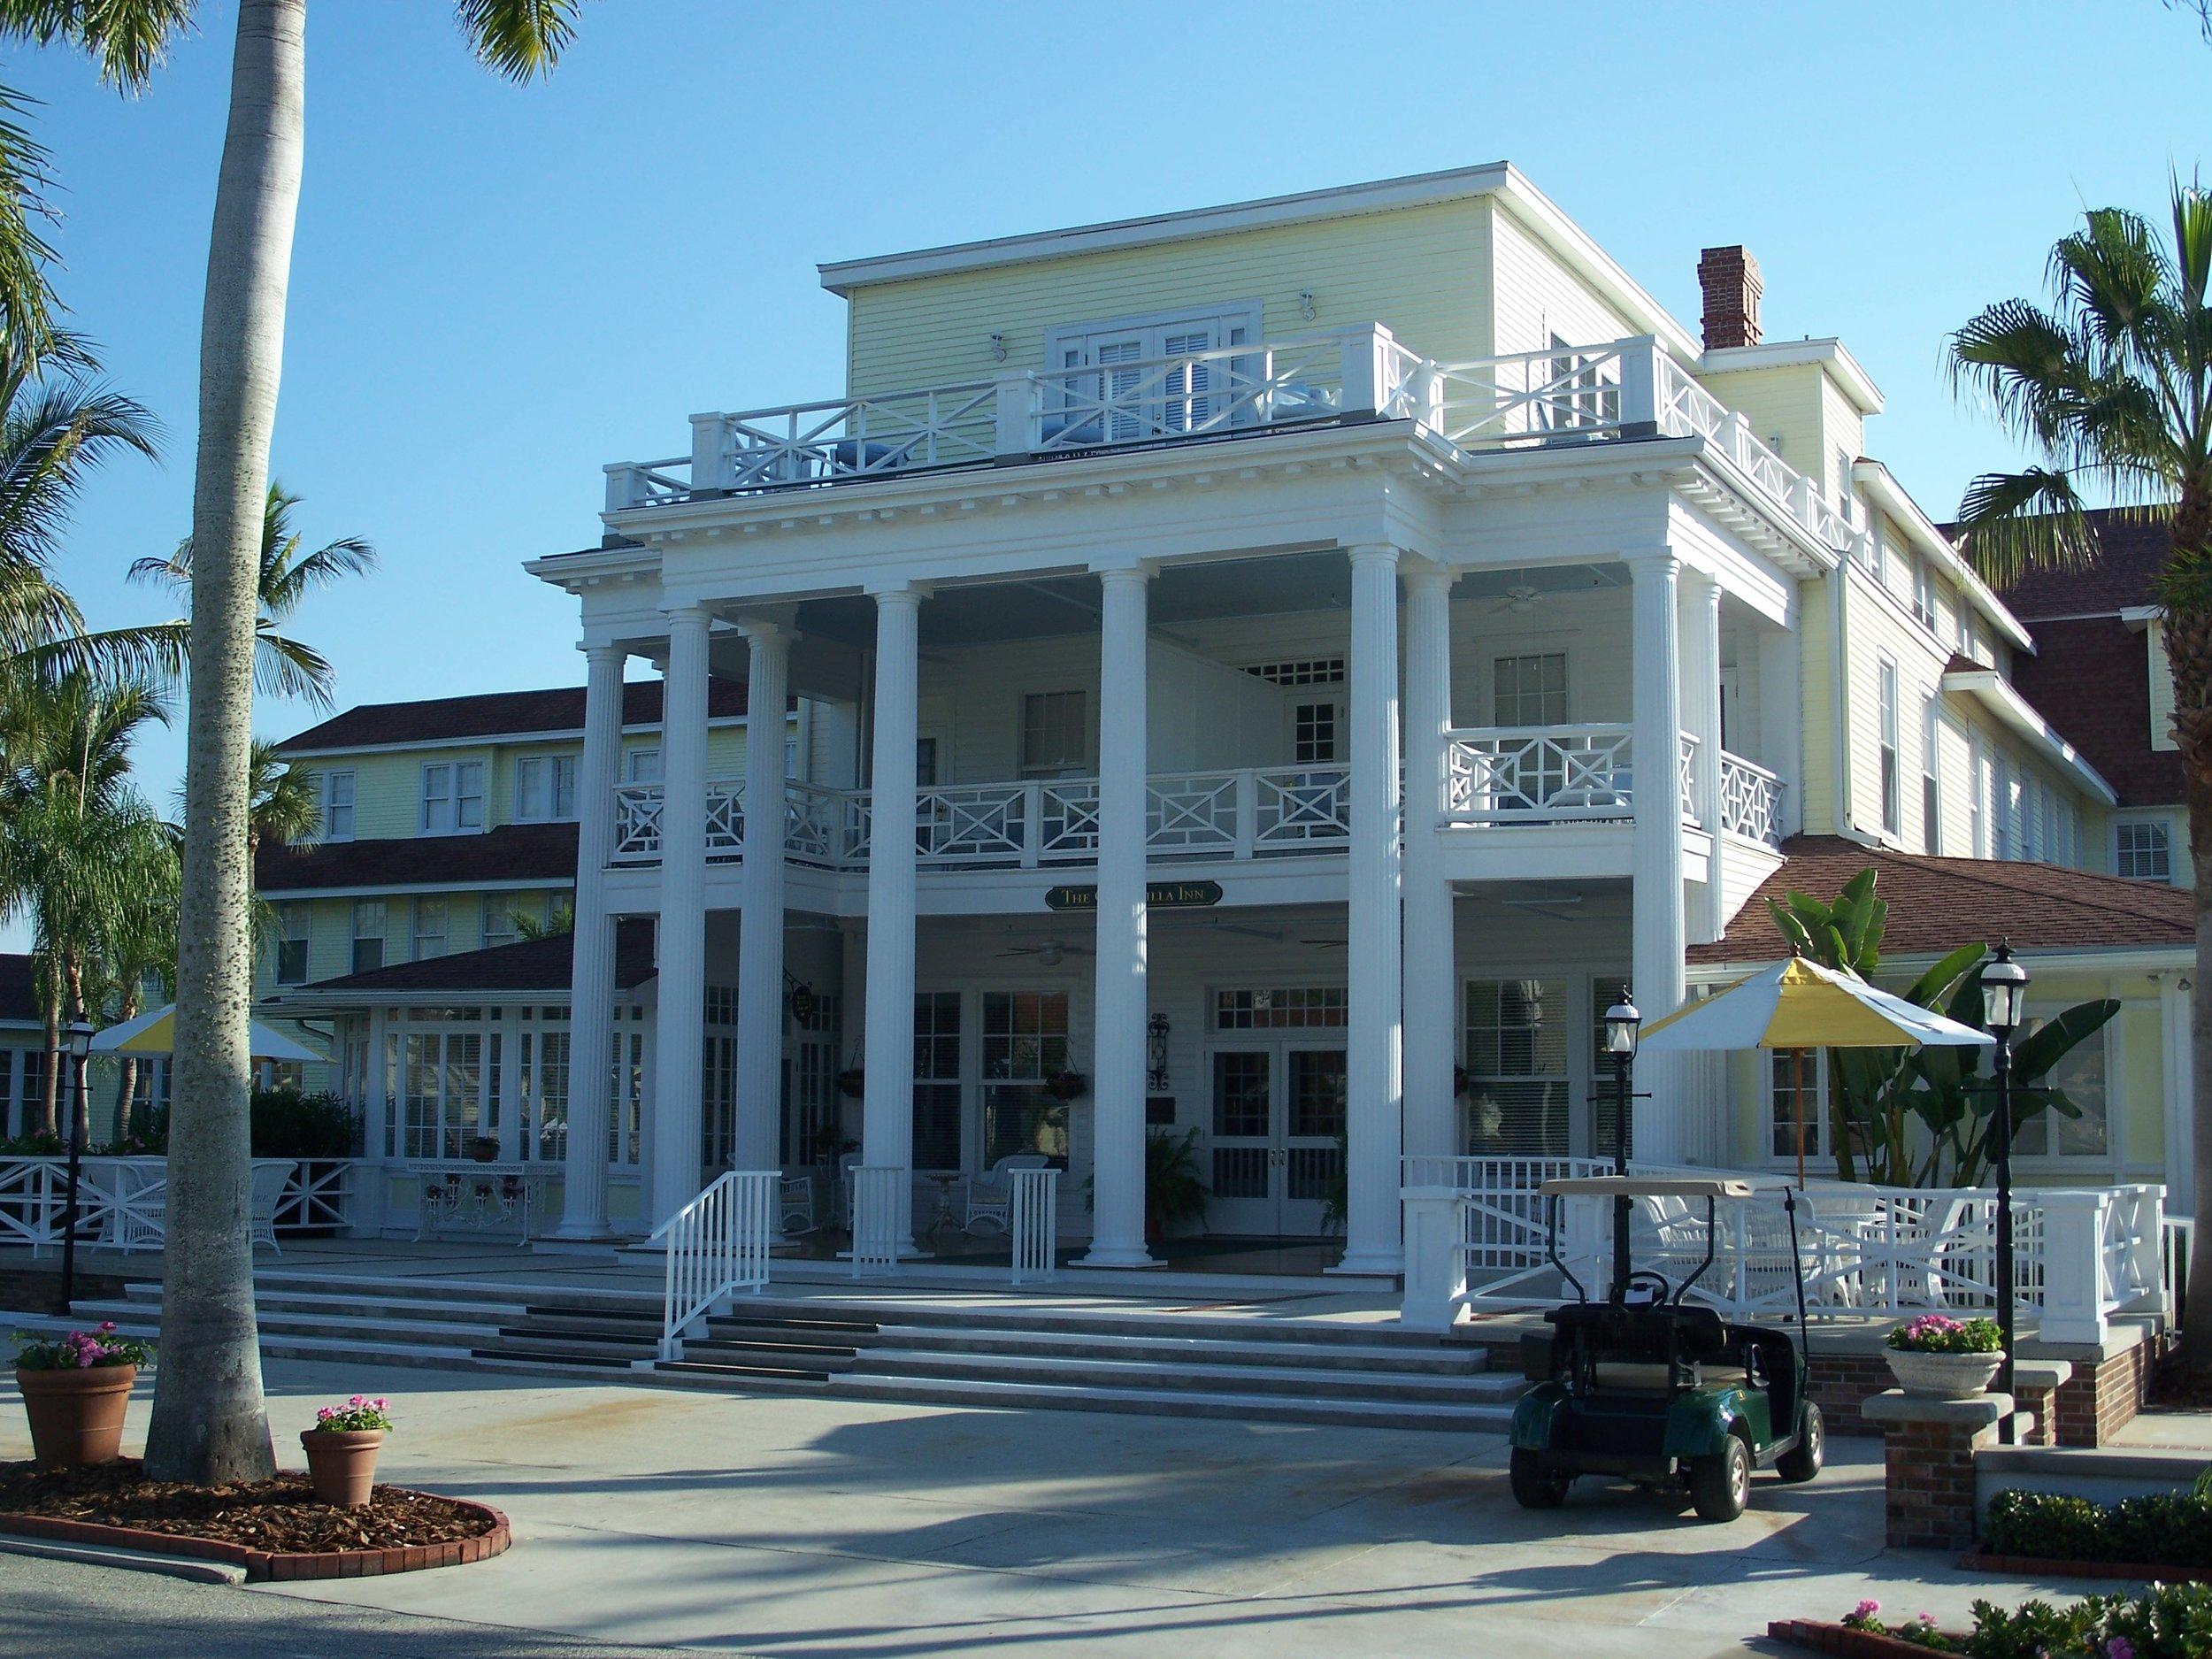 Boca_Grande_FL_Gasparilla_Inn01.jpg